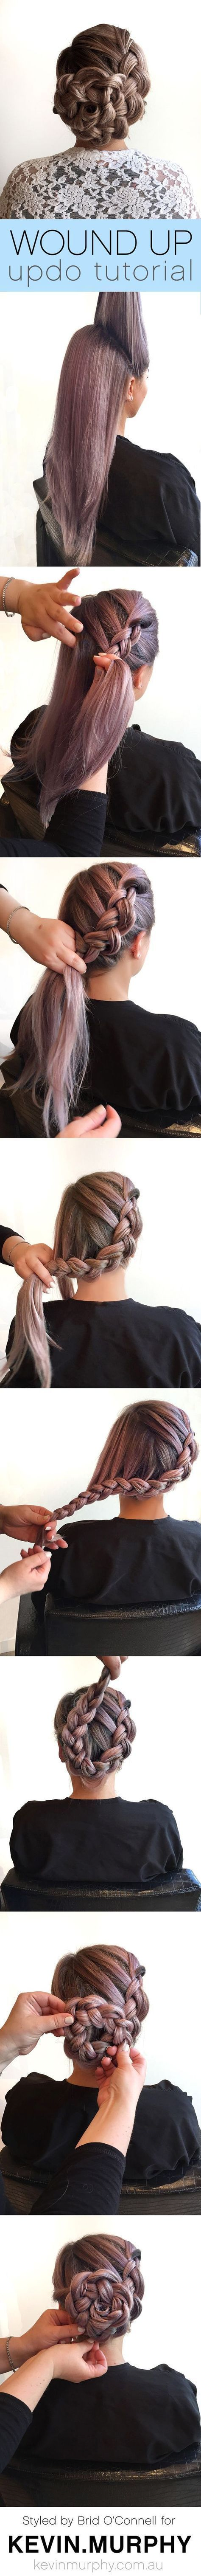 DIY Hairstyle // Beautiful braided updo hair tutorial. #SilkySmoothHair #diyhairstylesupdo